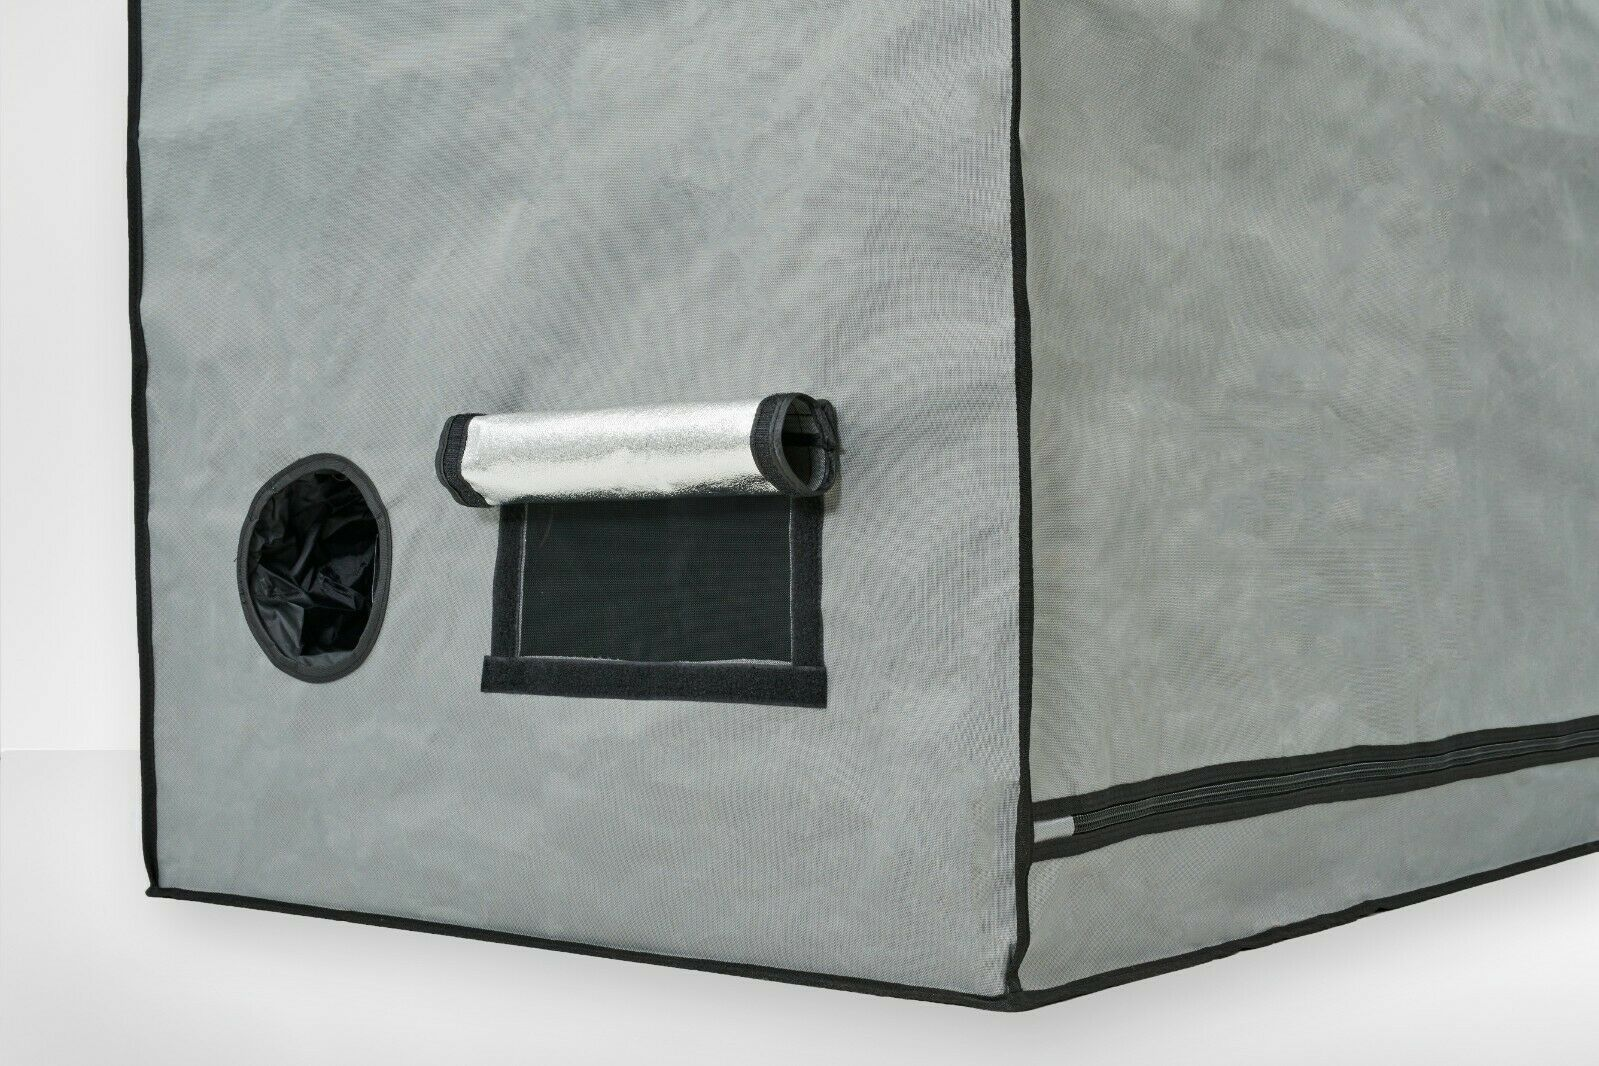 GROWBOX 80 x 120 x 200cm * Indoor Greenhouse Plant Tent BREEDING TENT Glass NEW